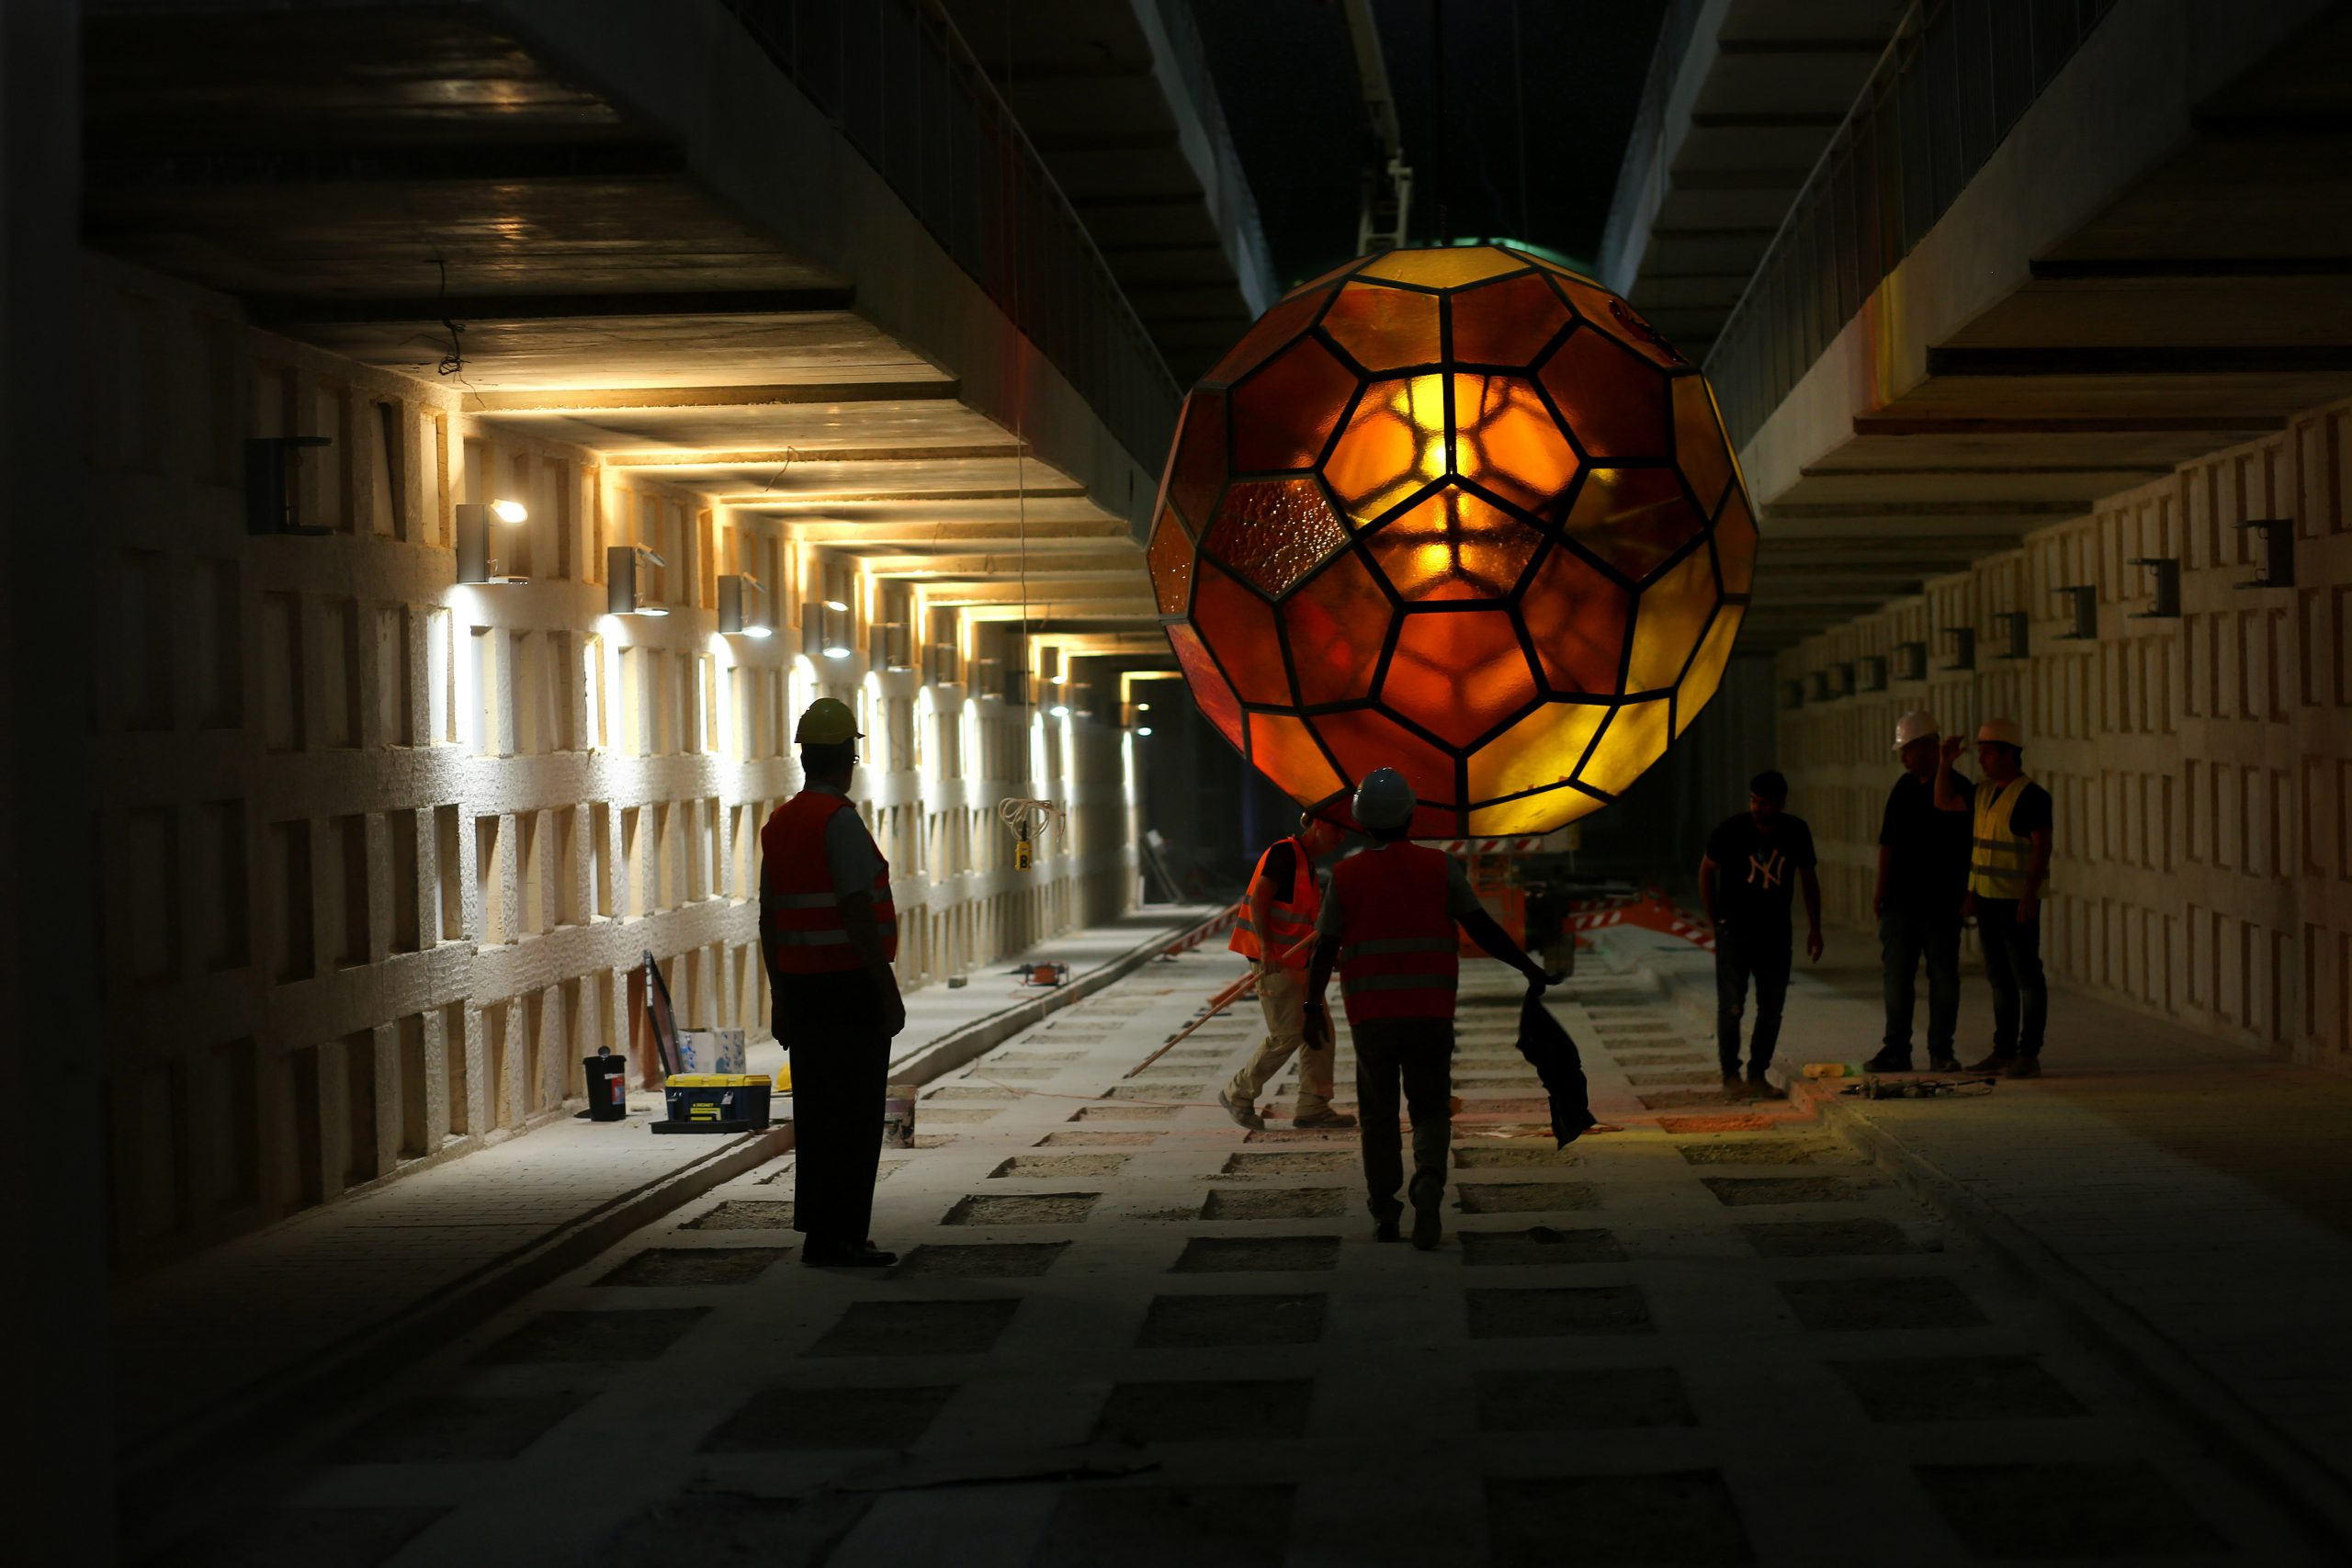 Art for eternity | Monumental spheres of light for the world's largest underground cemetery in Jerusalem